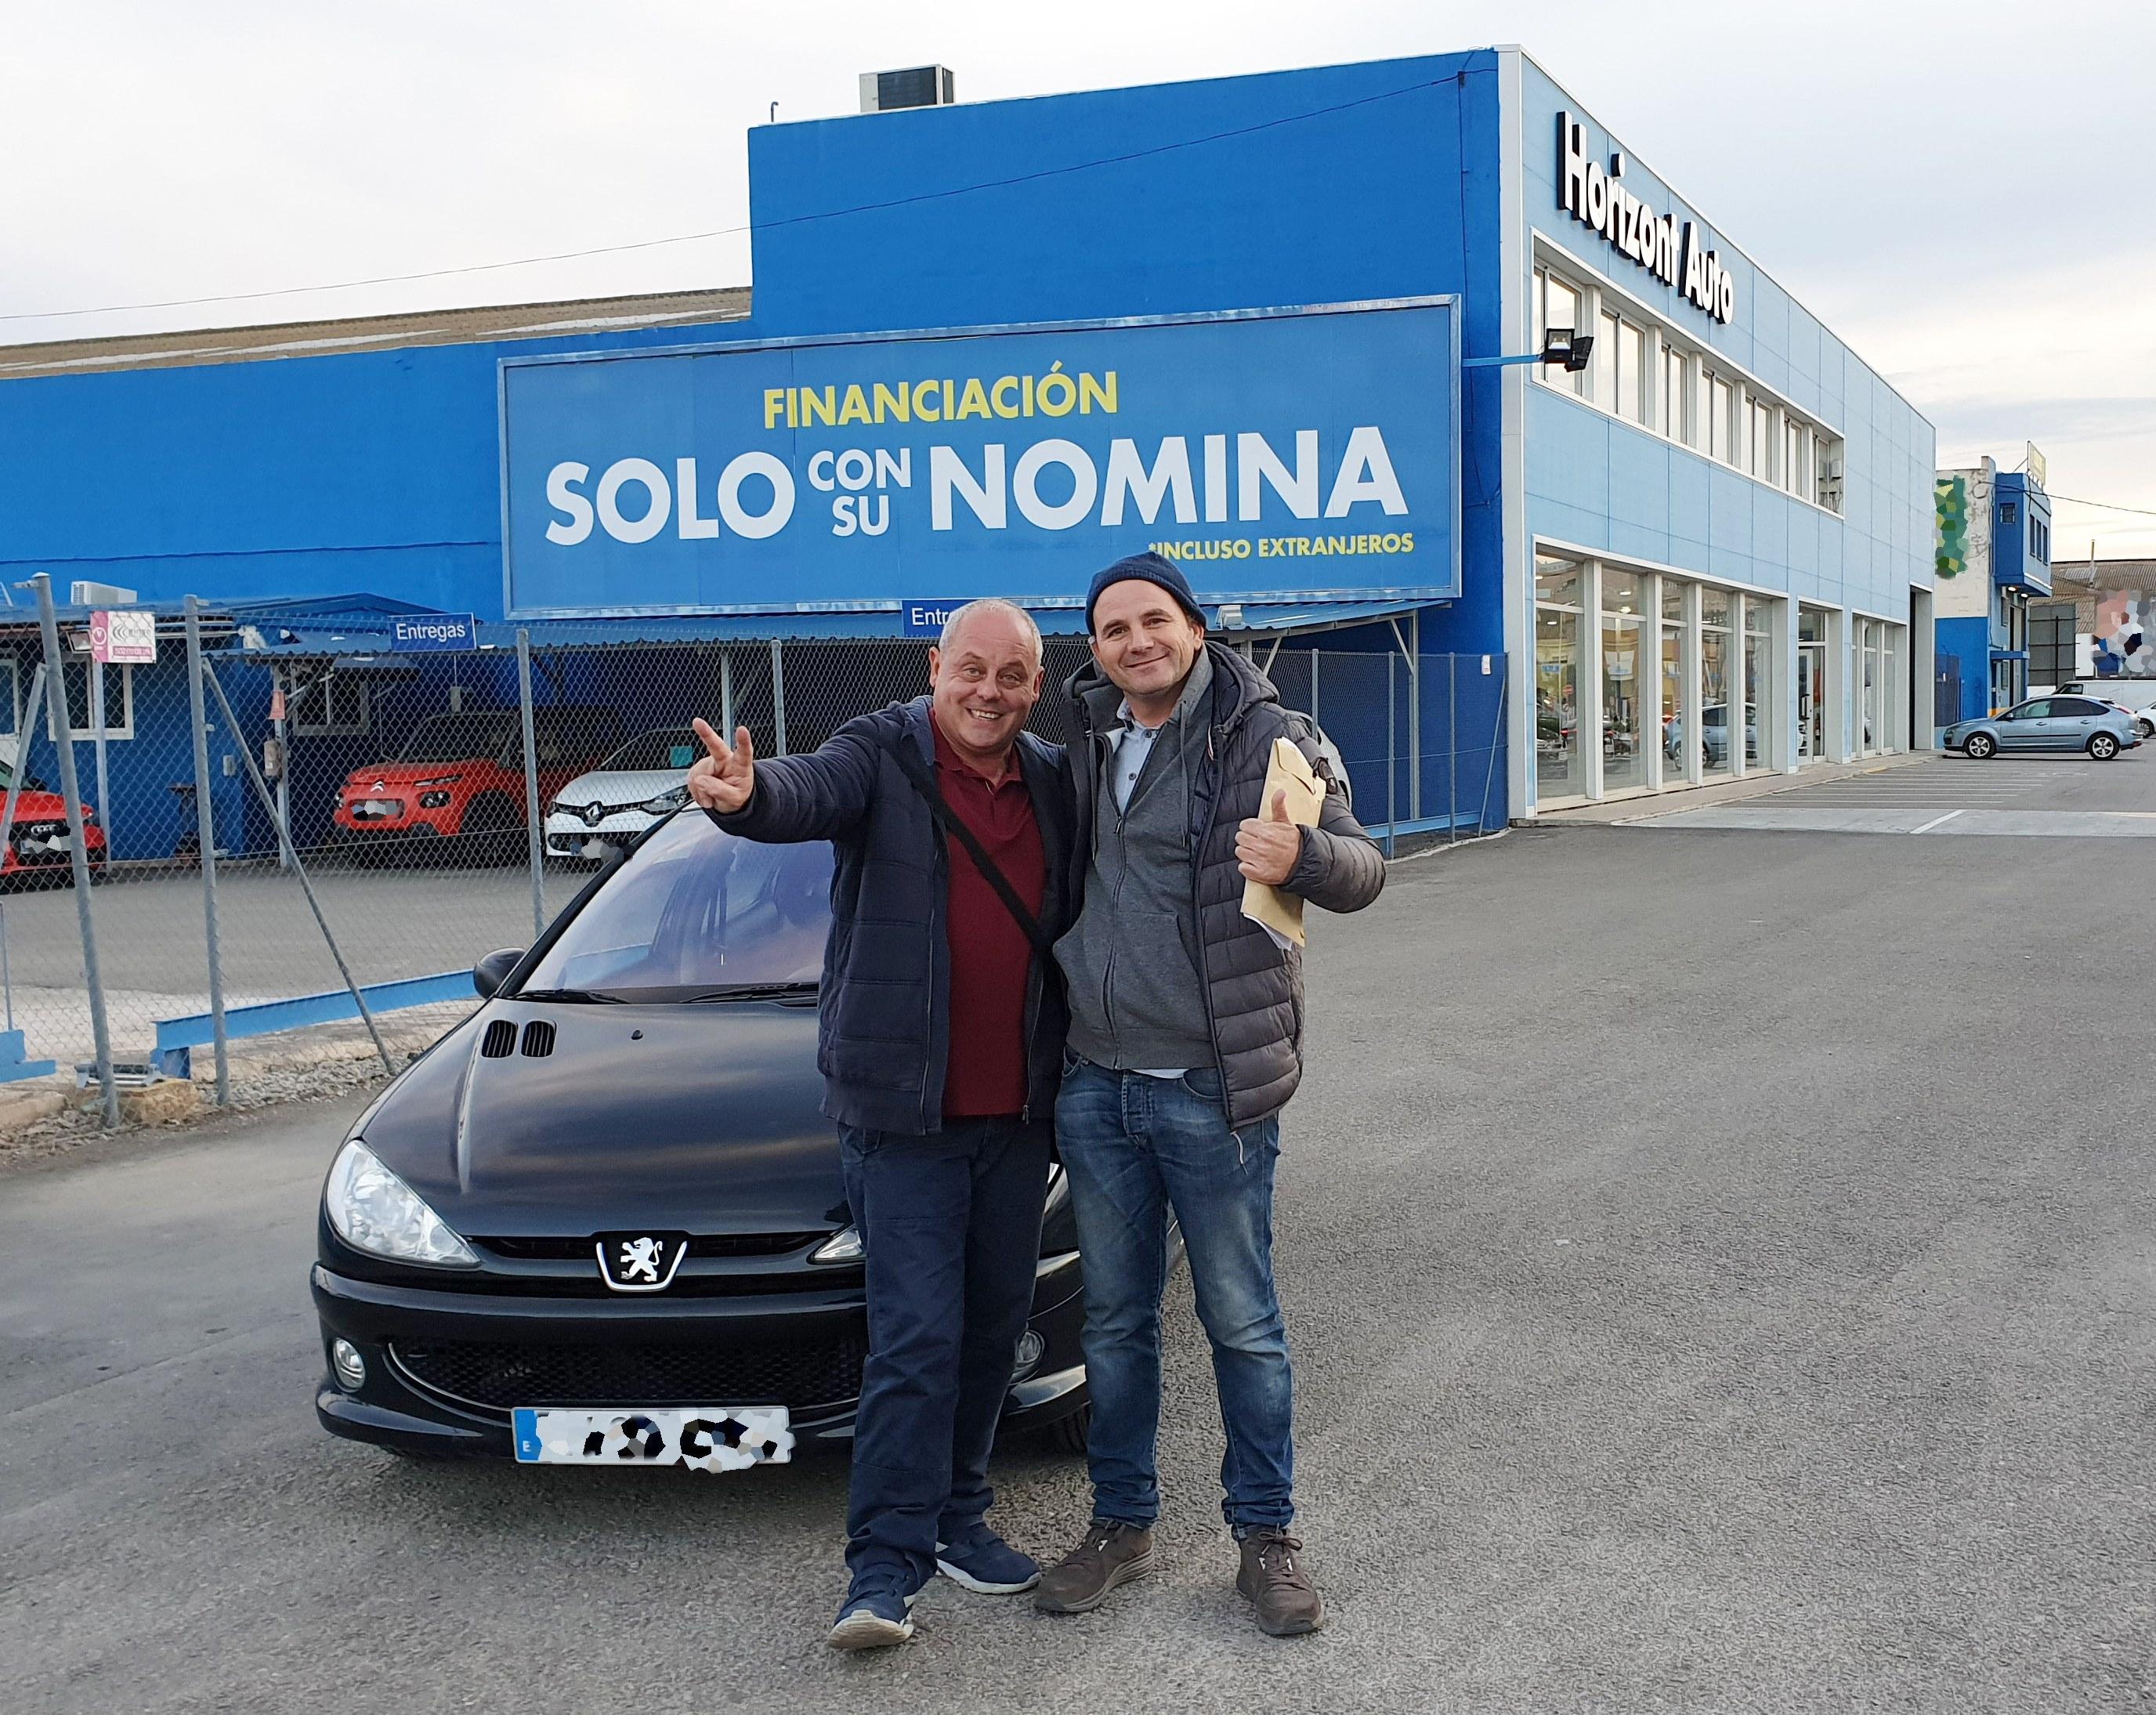 Venta Peugeot Valencia